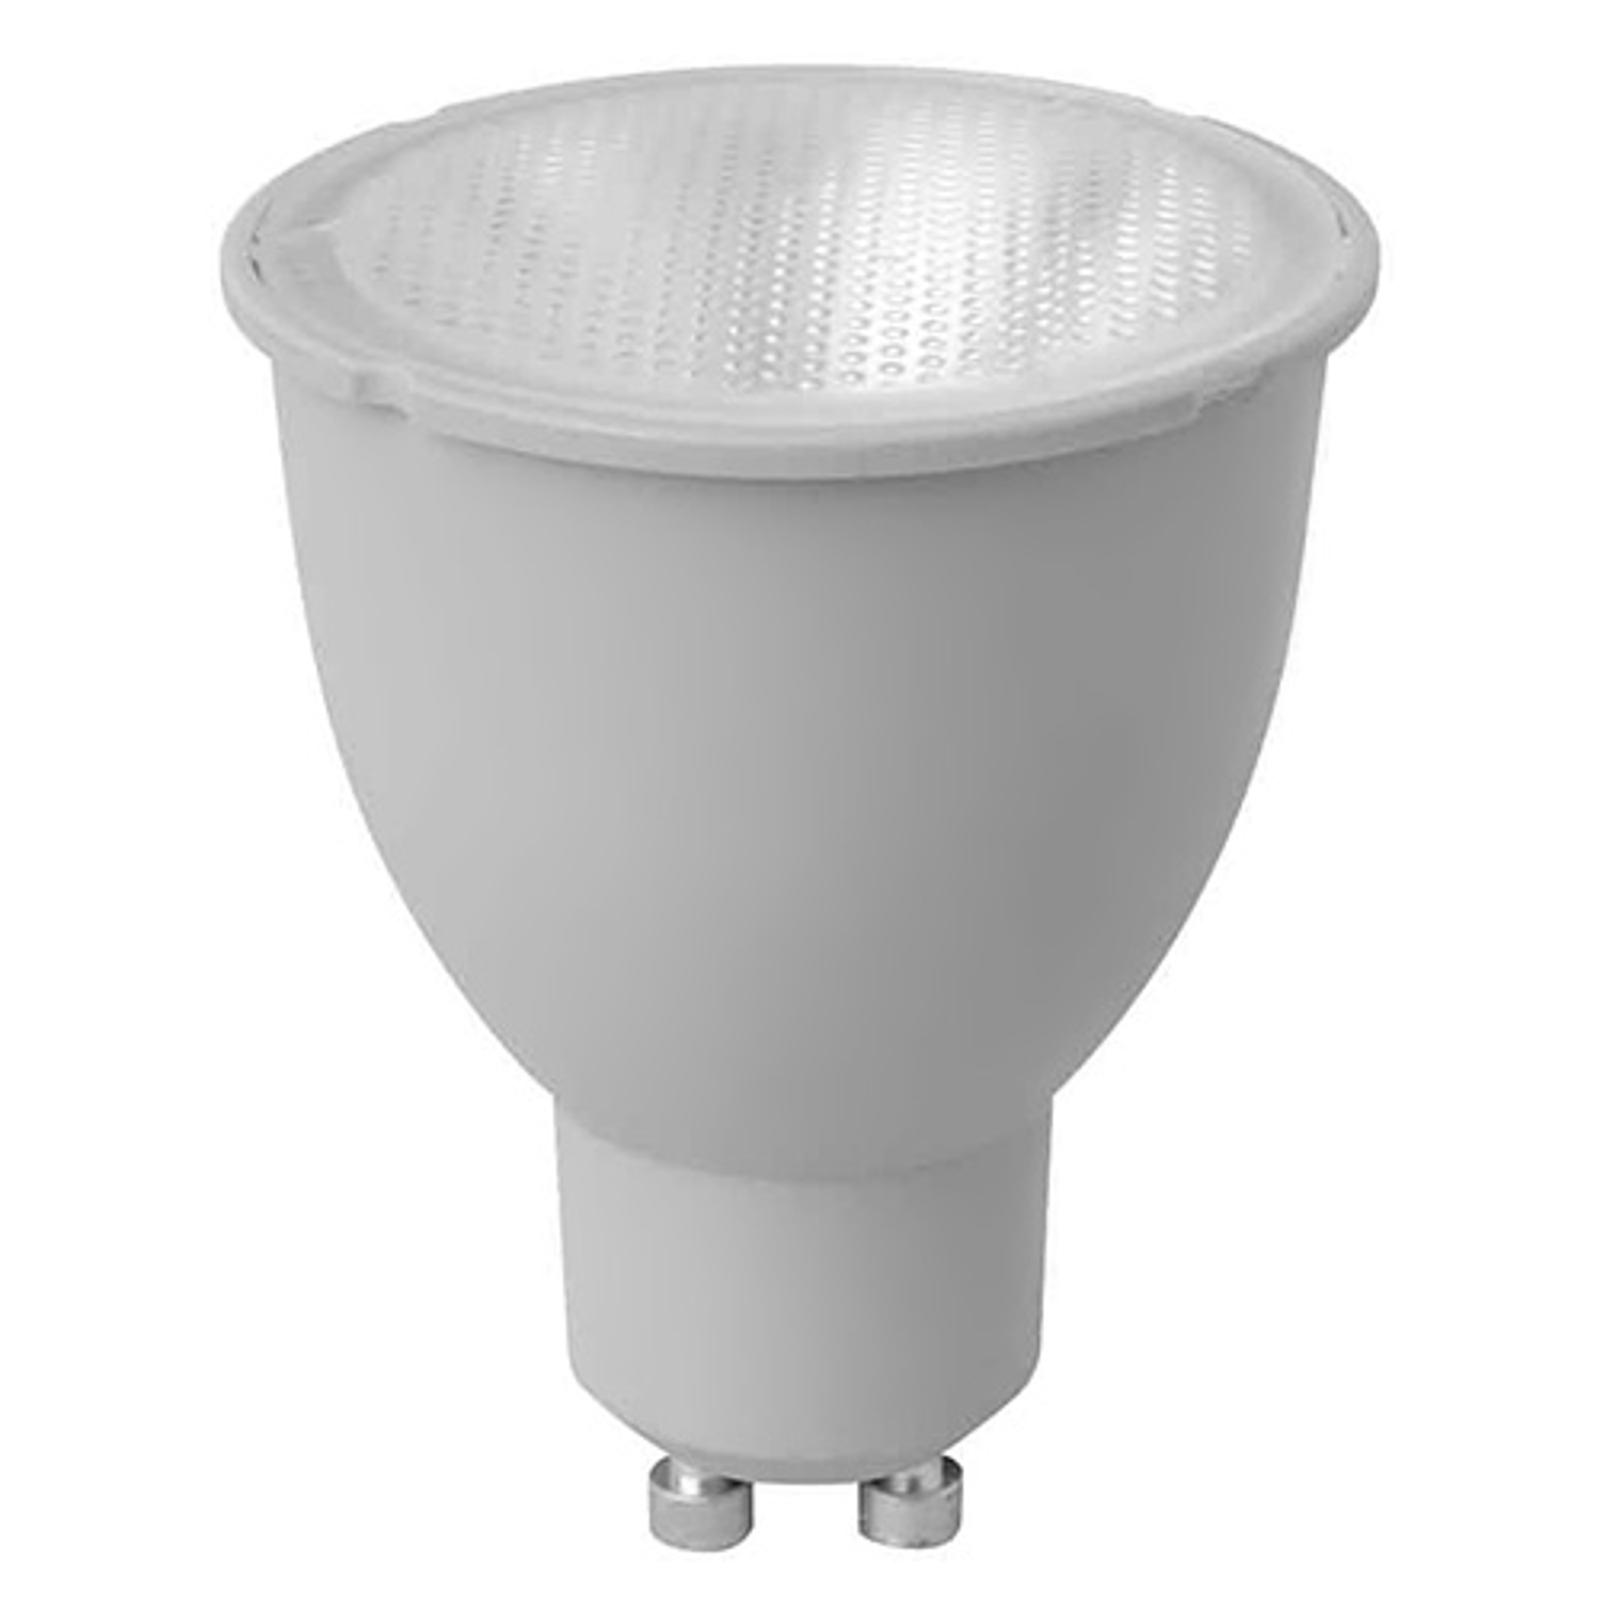 GU10 8W 828 LED reflector MEGAMAN Smart Lighting